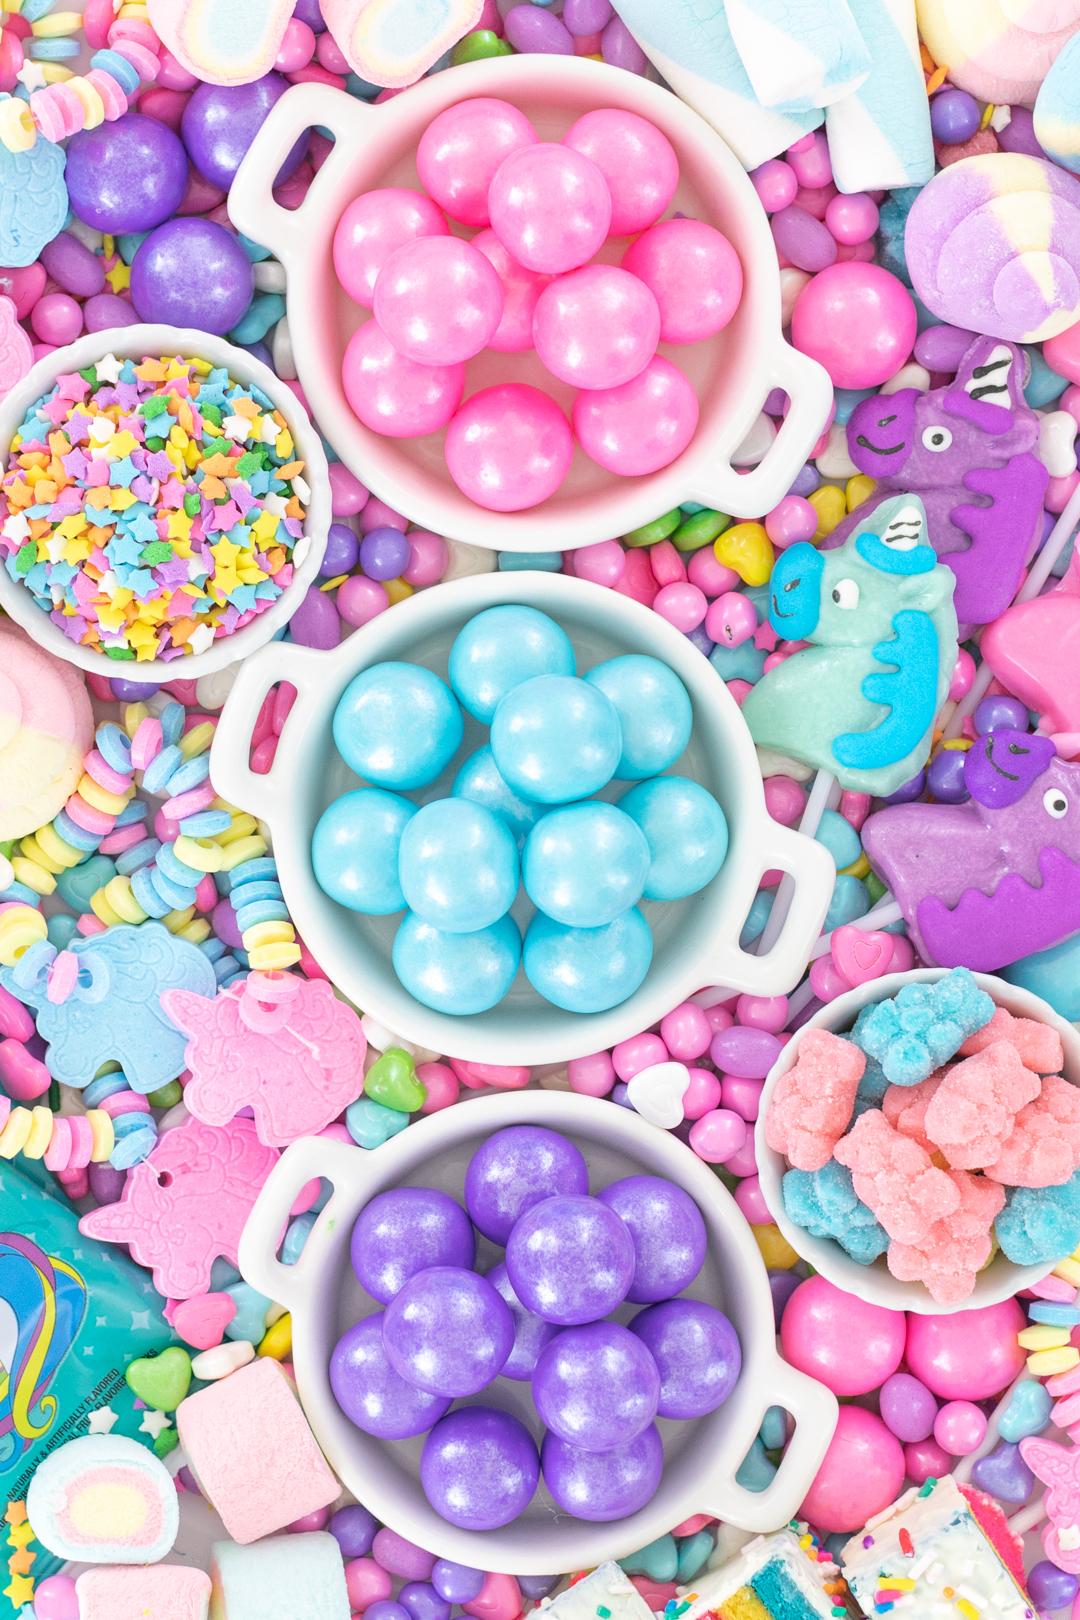 pretty tray of unicorn candy and gum. pink, blue, purple. unicorn candy bracelets